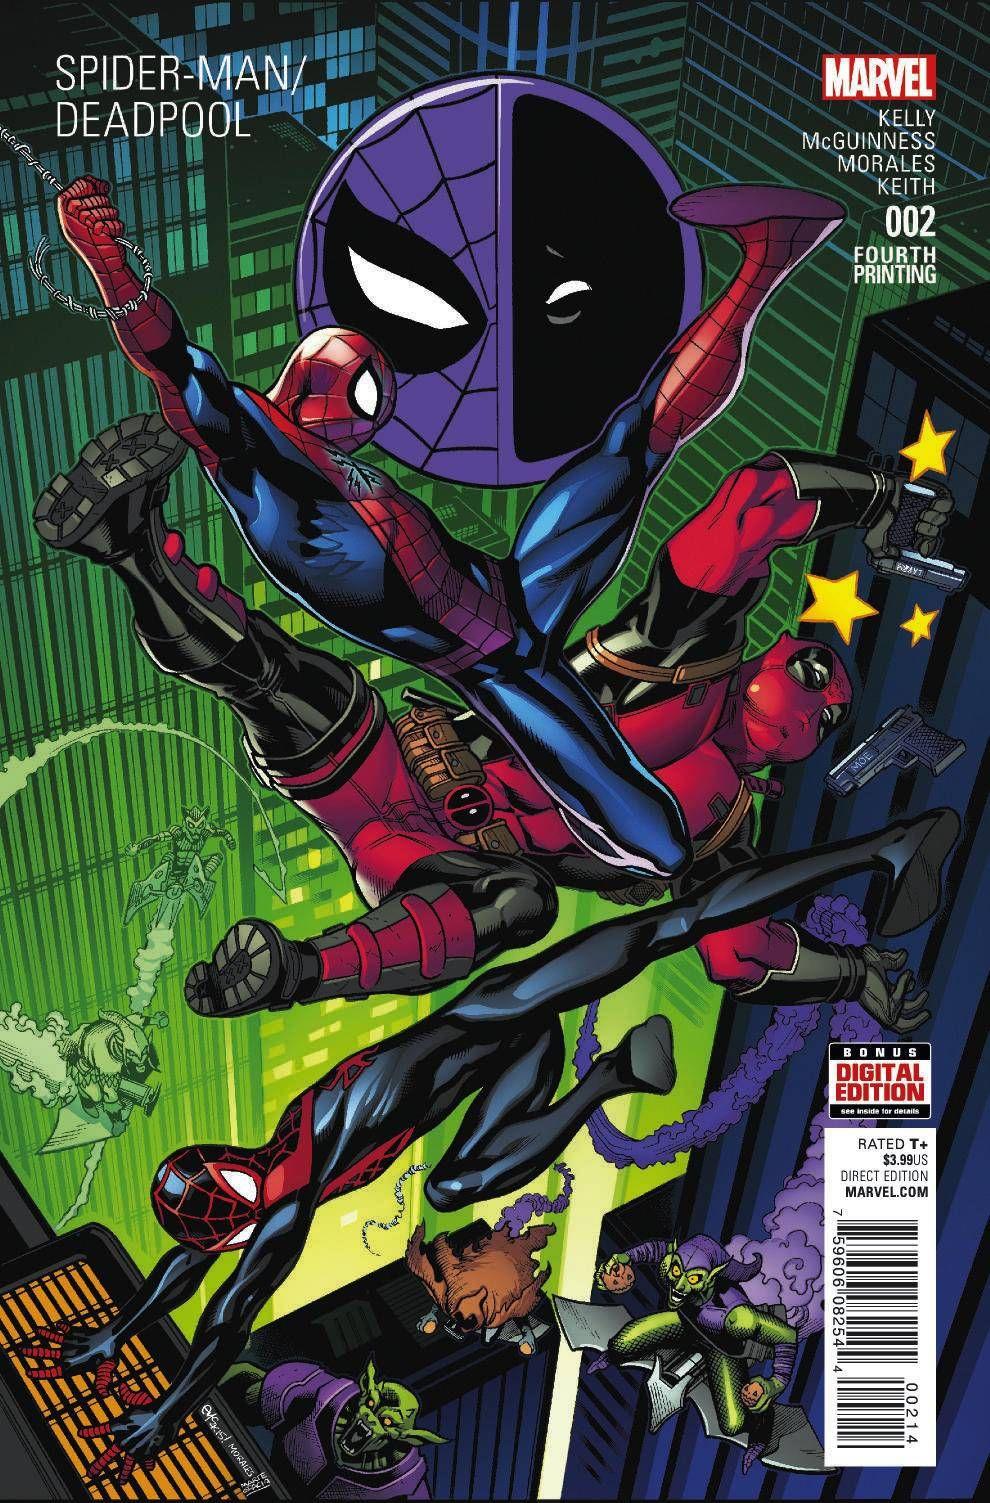 ComicsOdissey — SPIDER-MAN DEADPOOL #2 | Spidey | Pinterest | Cuatro ...